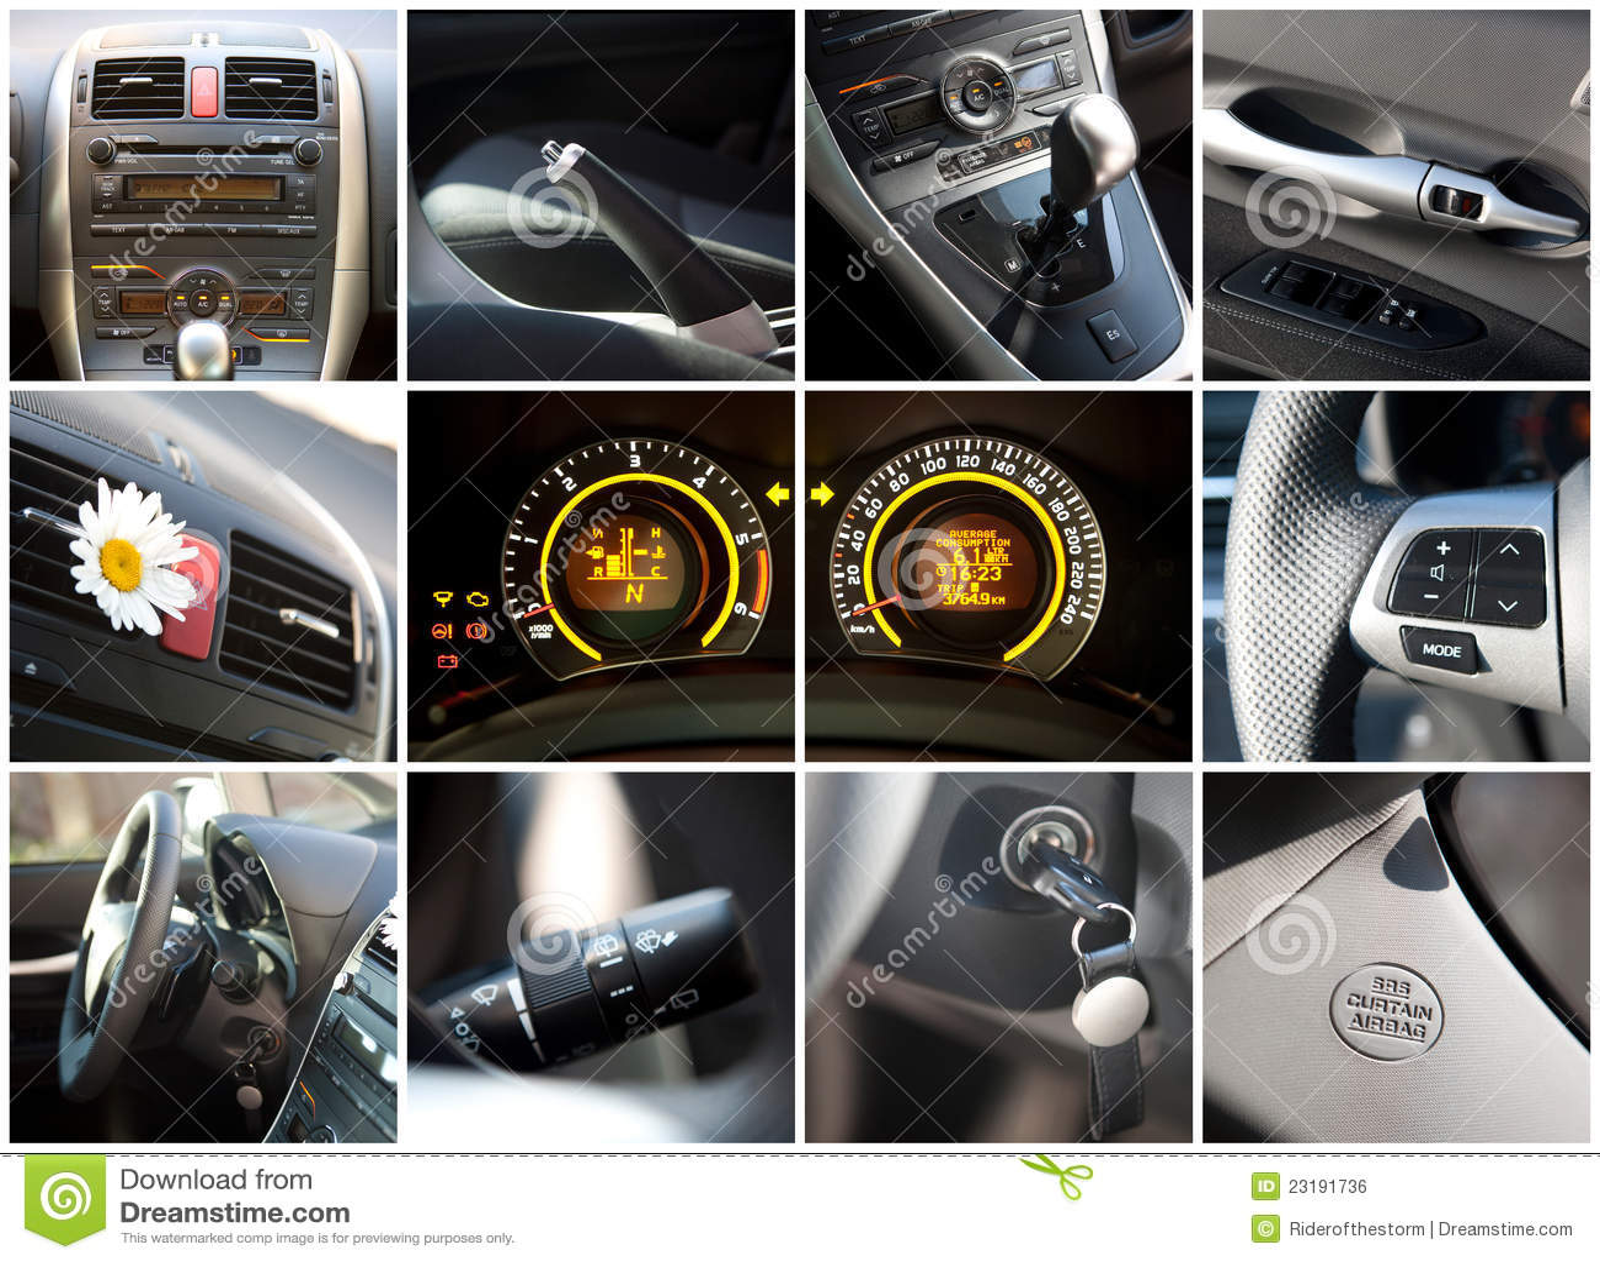 car interior stock photo image of control equipment 23191736. Black Bedroom Furniture Sets. Home Design Ideas